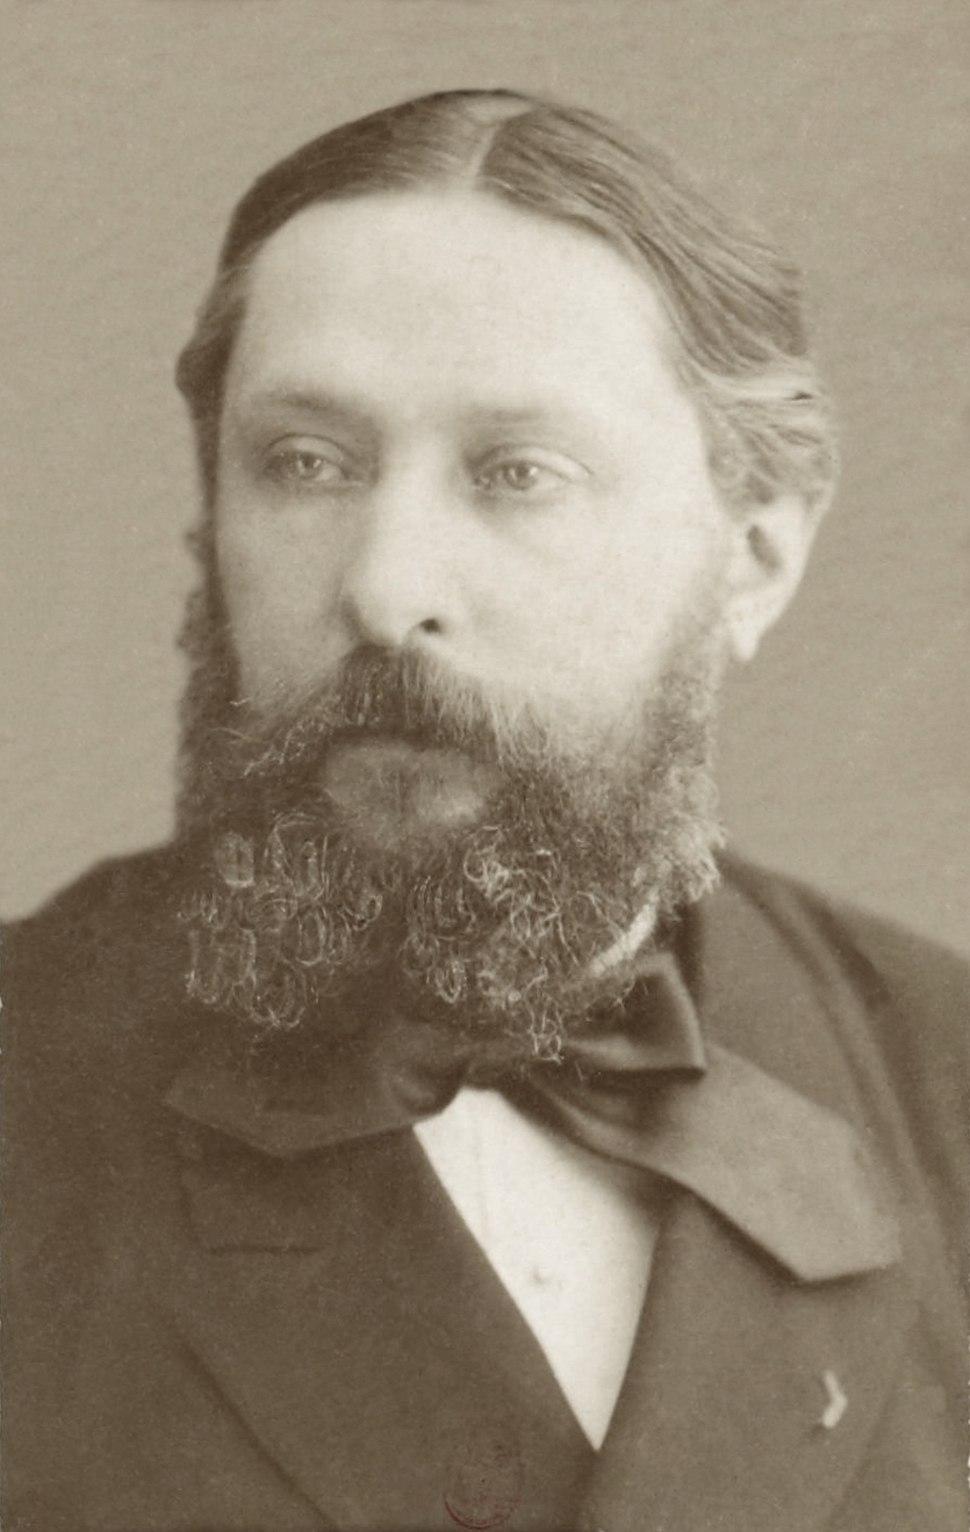 Sully Prudhomme, René-François-Armand, BNF Gallica